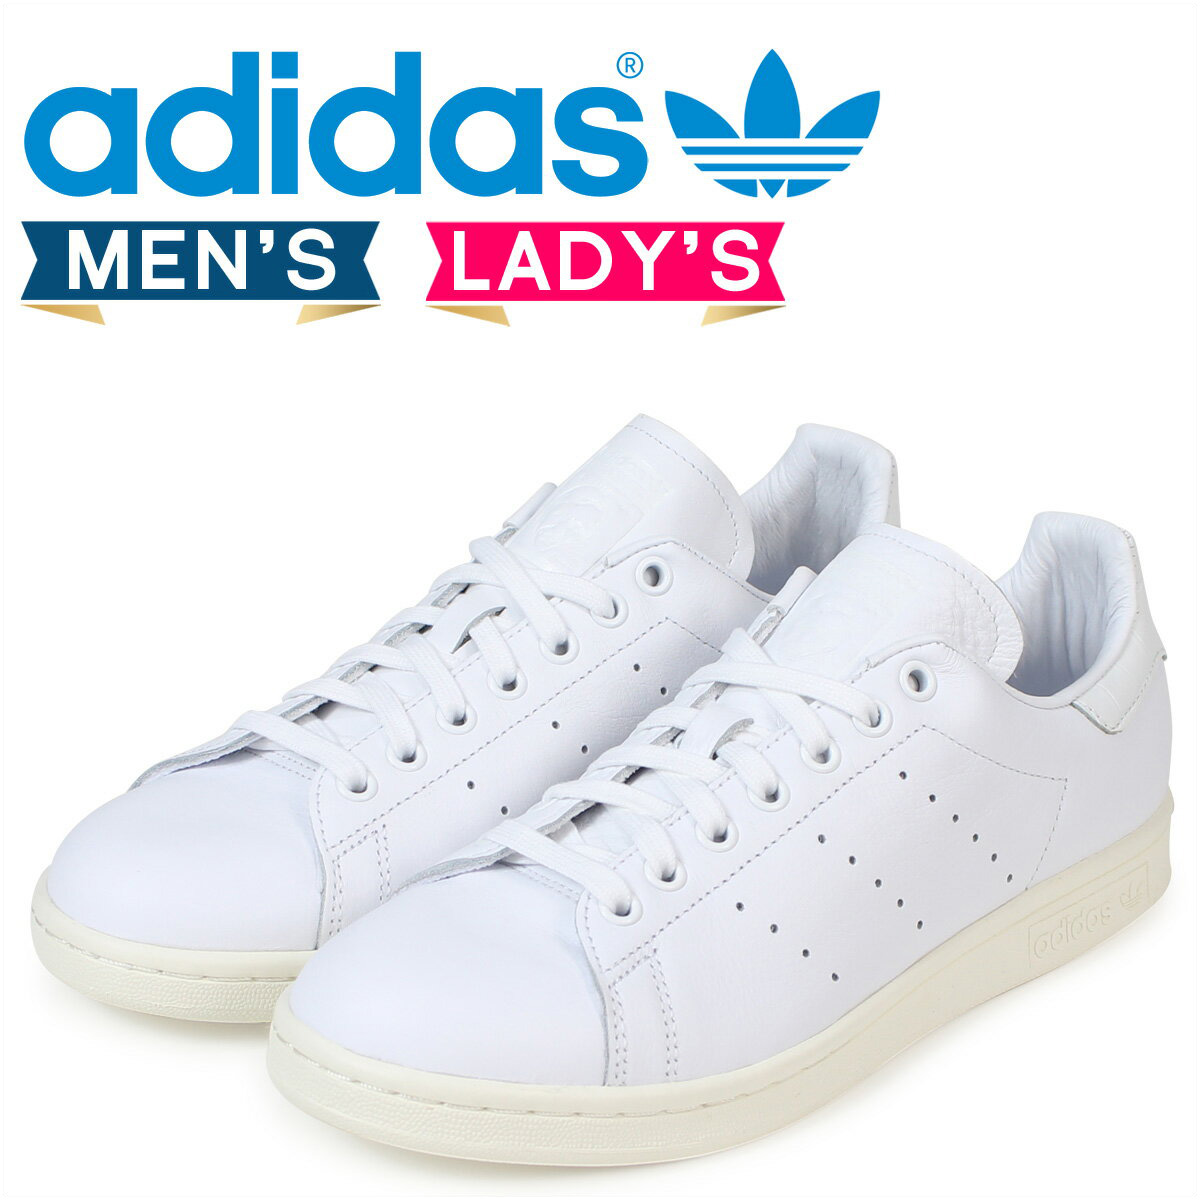 adidas originals オリジナルス スタンスミス アディダス STAN SMITH レディース メンズ スニーカー BZ0466 靴 ホワイト